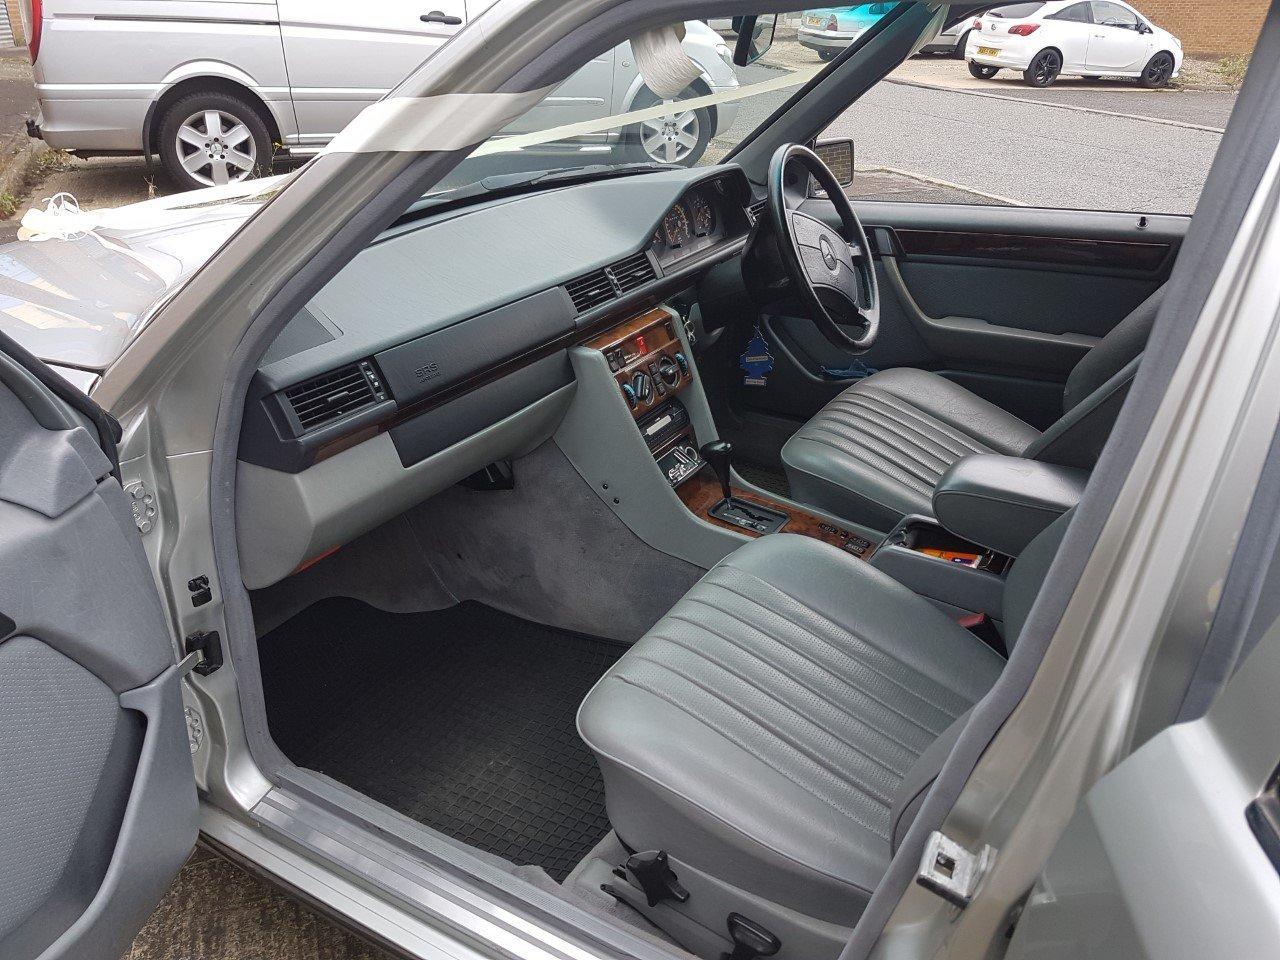 1992 Mercedes 6 door limousine For Sale (picture 5 of 6)